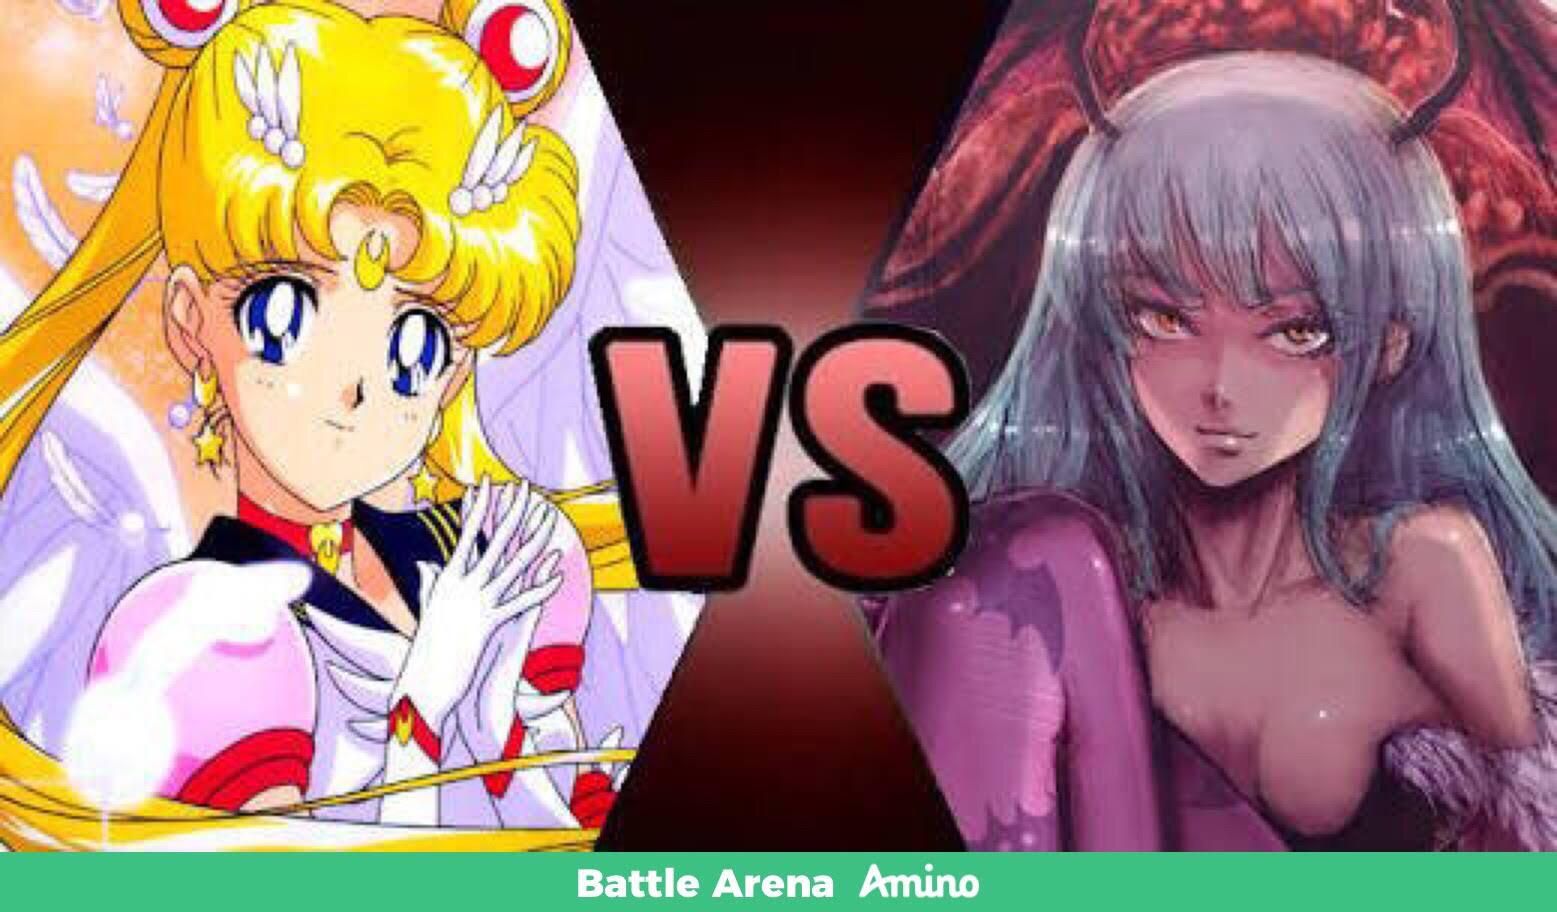 The Moon Princess versus the princess of Shadows